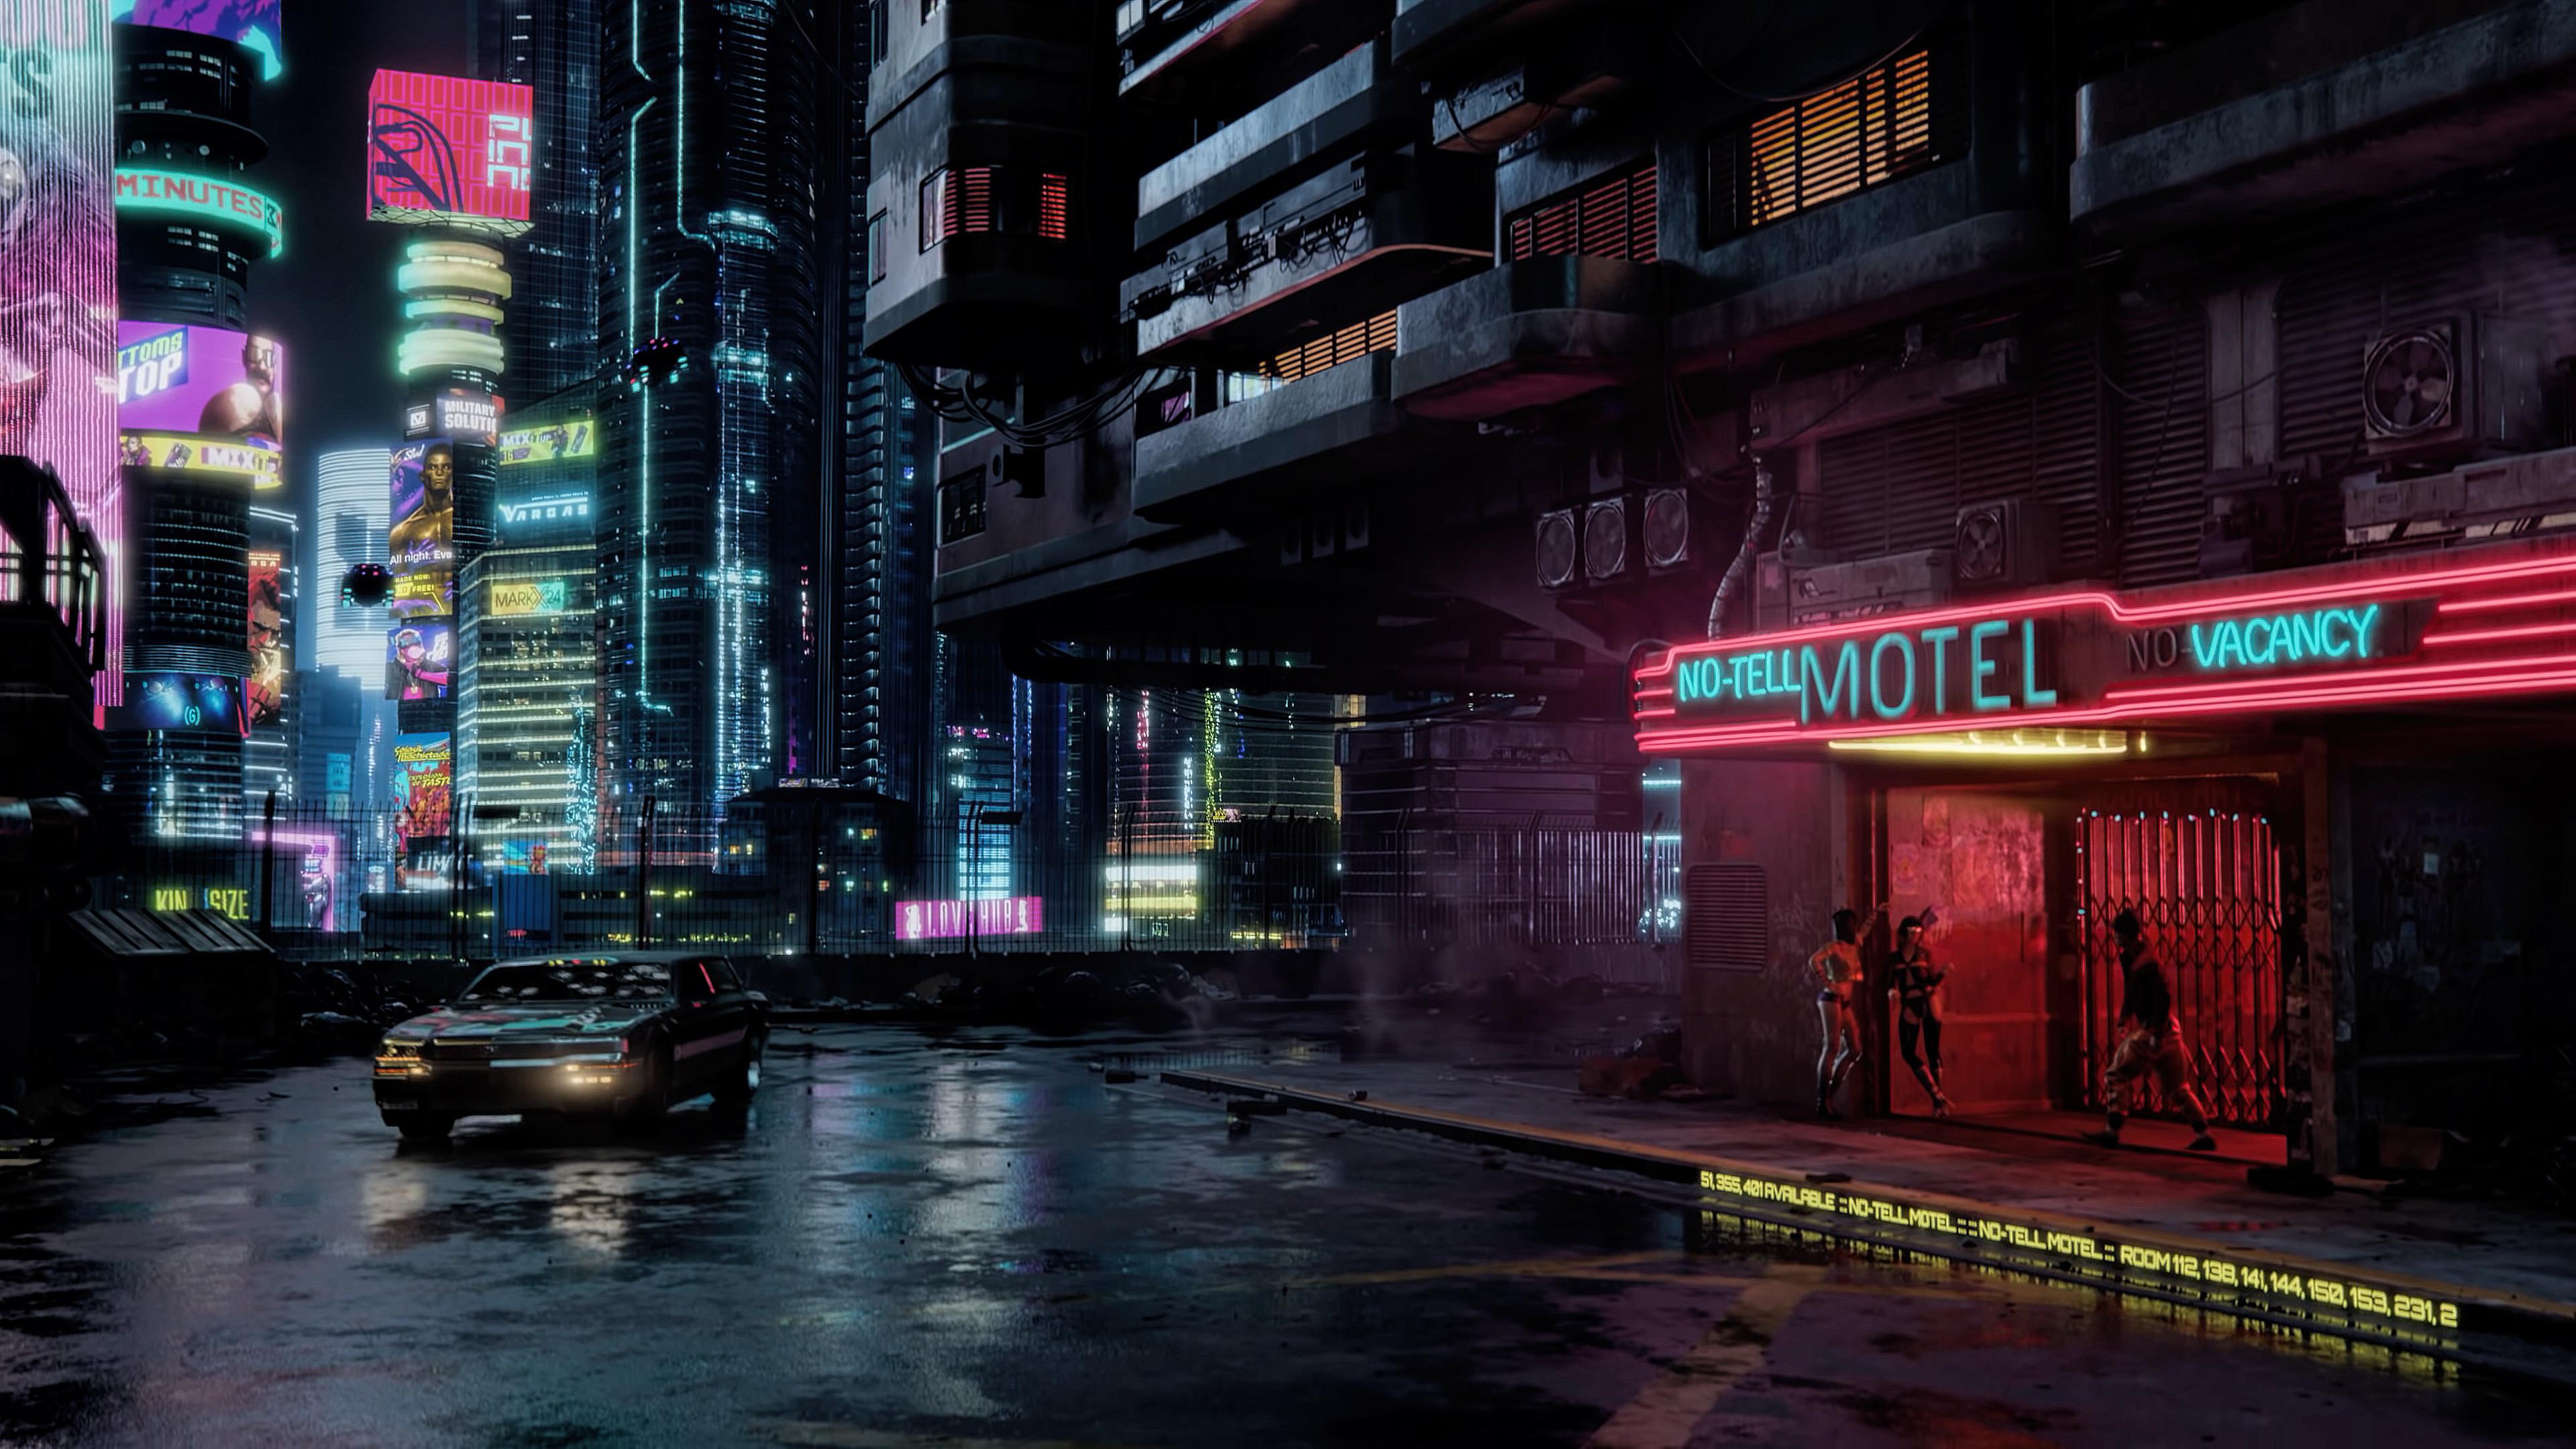 Cyberpunk 2077 Backgrounds Posted By Samantha Peltier